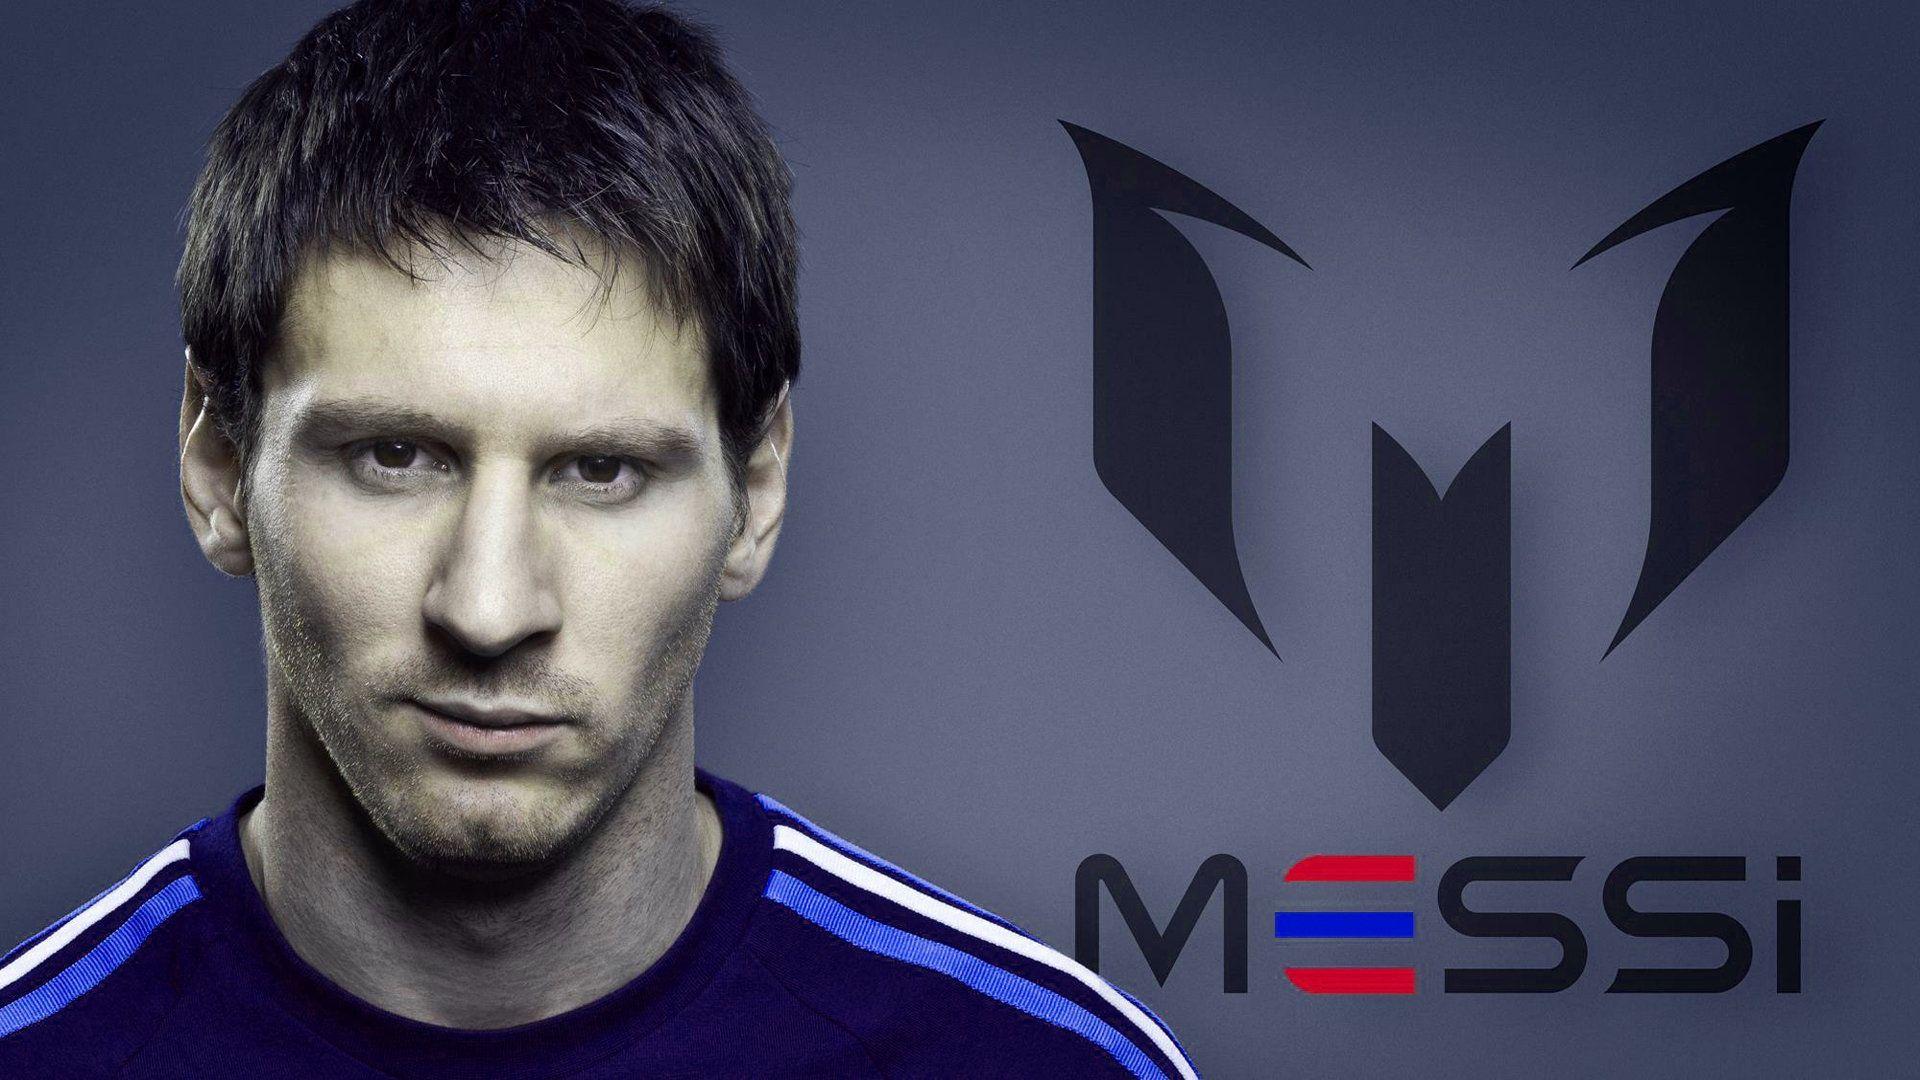 Lionel Messi Full Size Hd: Lionel Messi HD Wallpaper